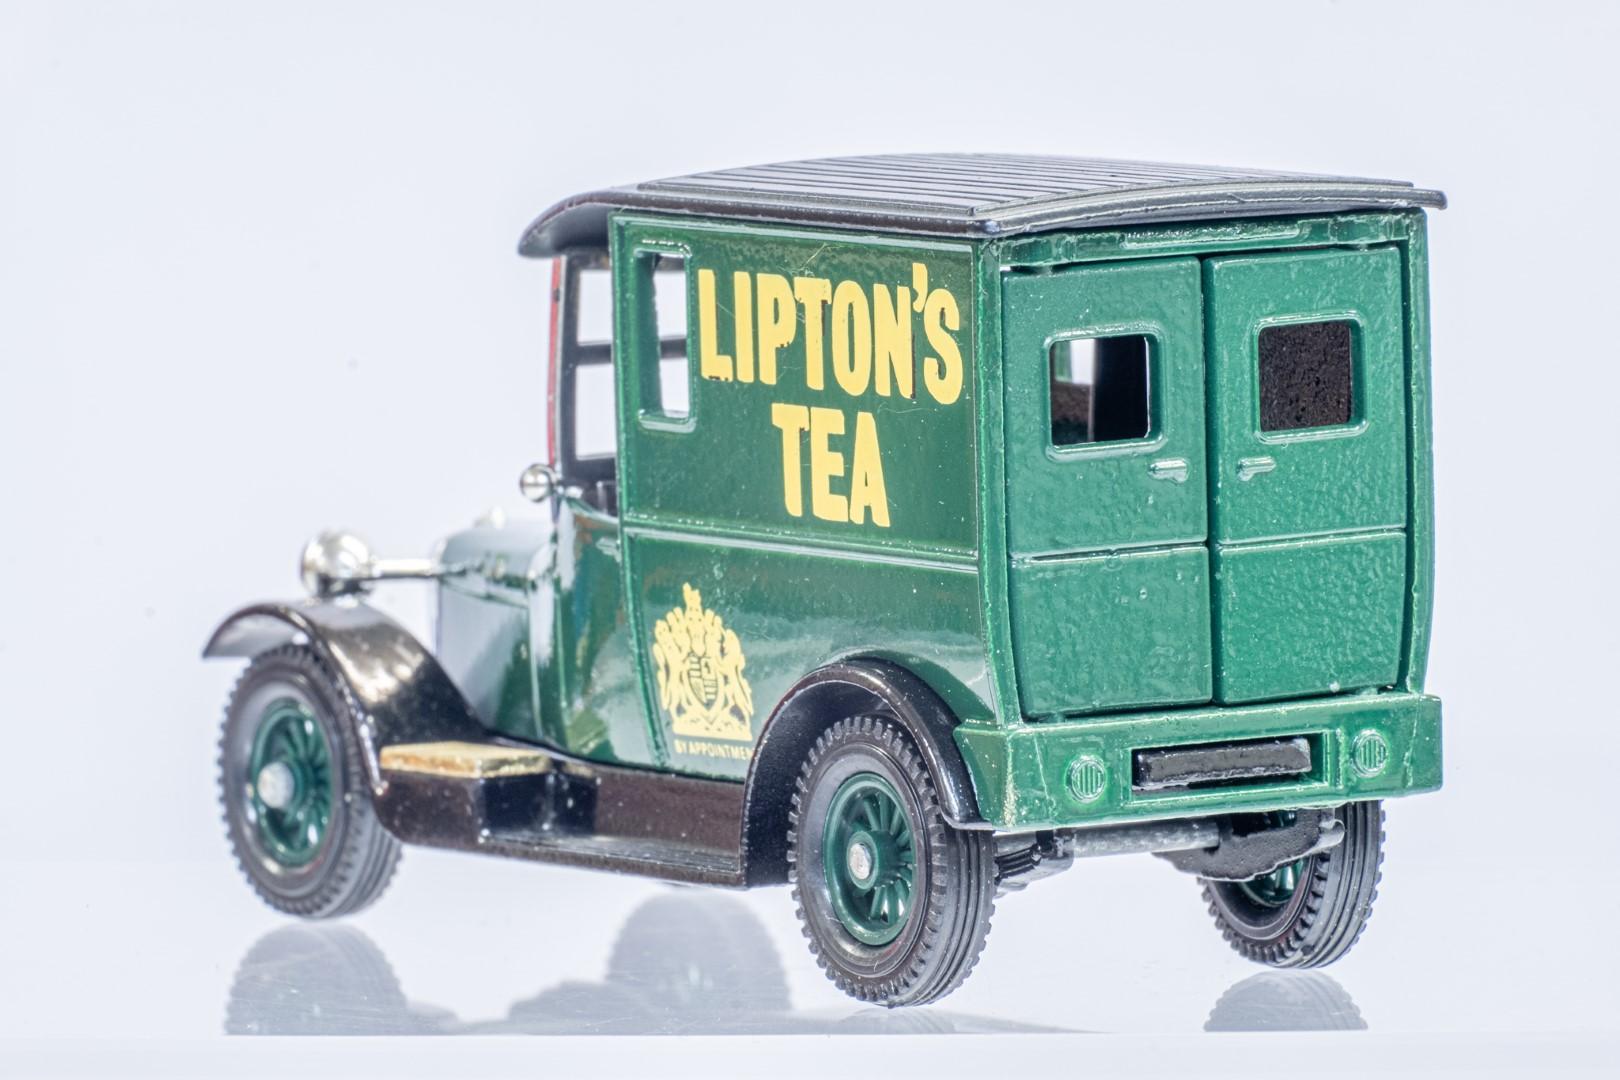 Matchbox 1927 Talbot Van Y-5 - Liptions Tea - Rare - Image 7 of 9